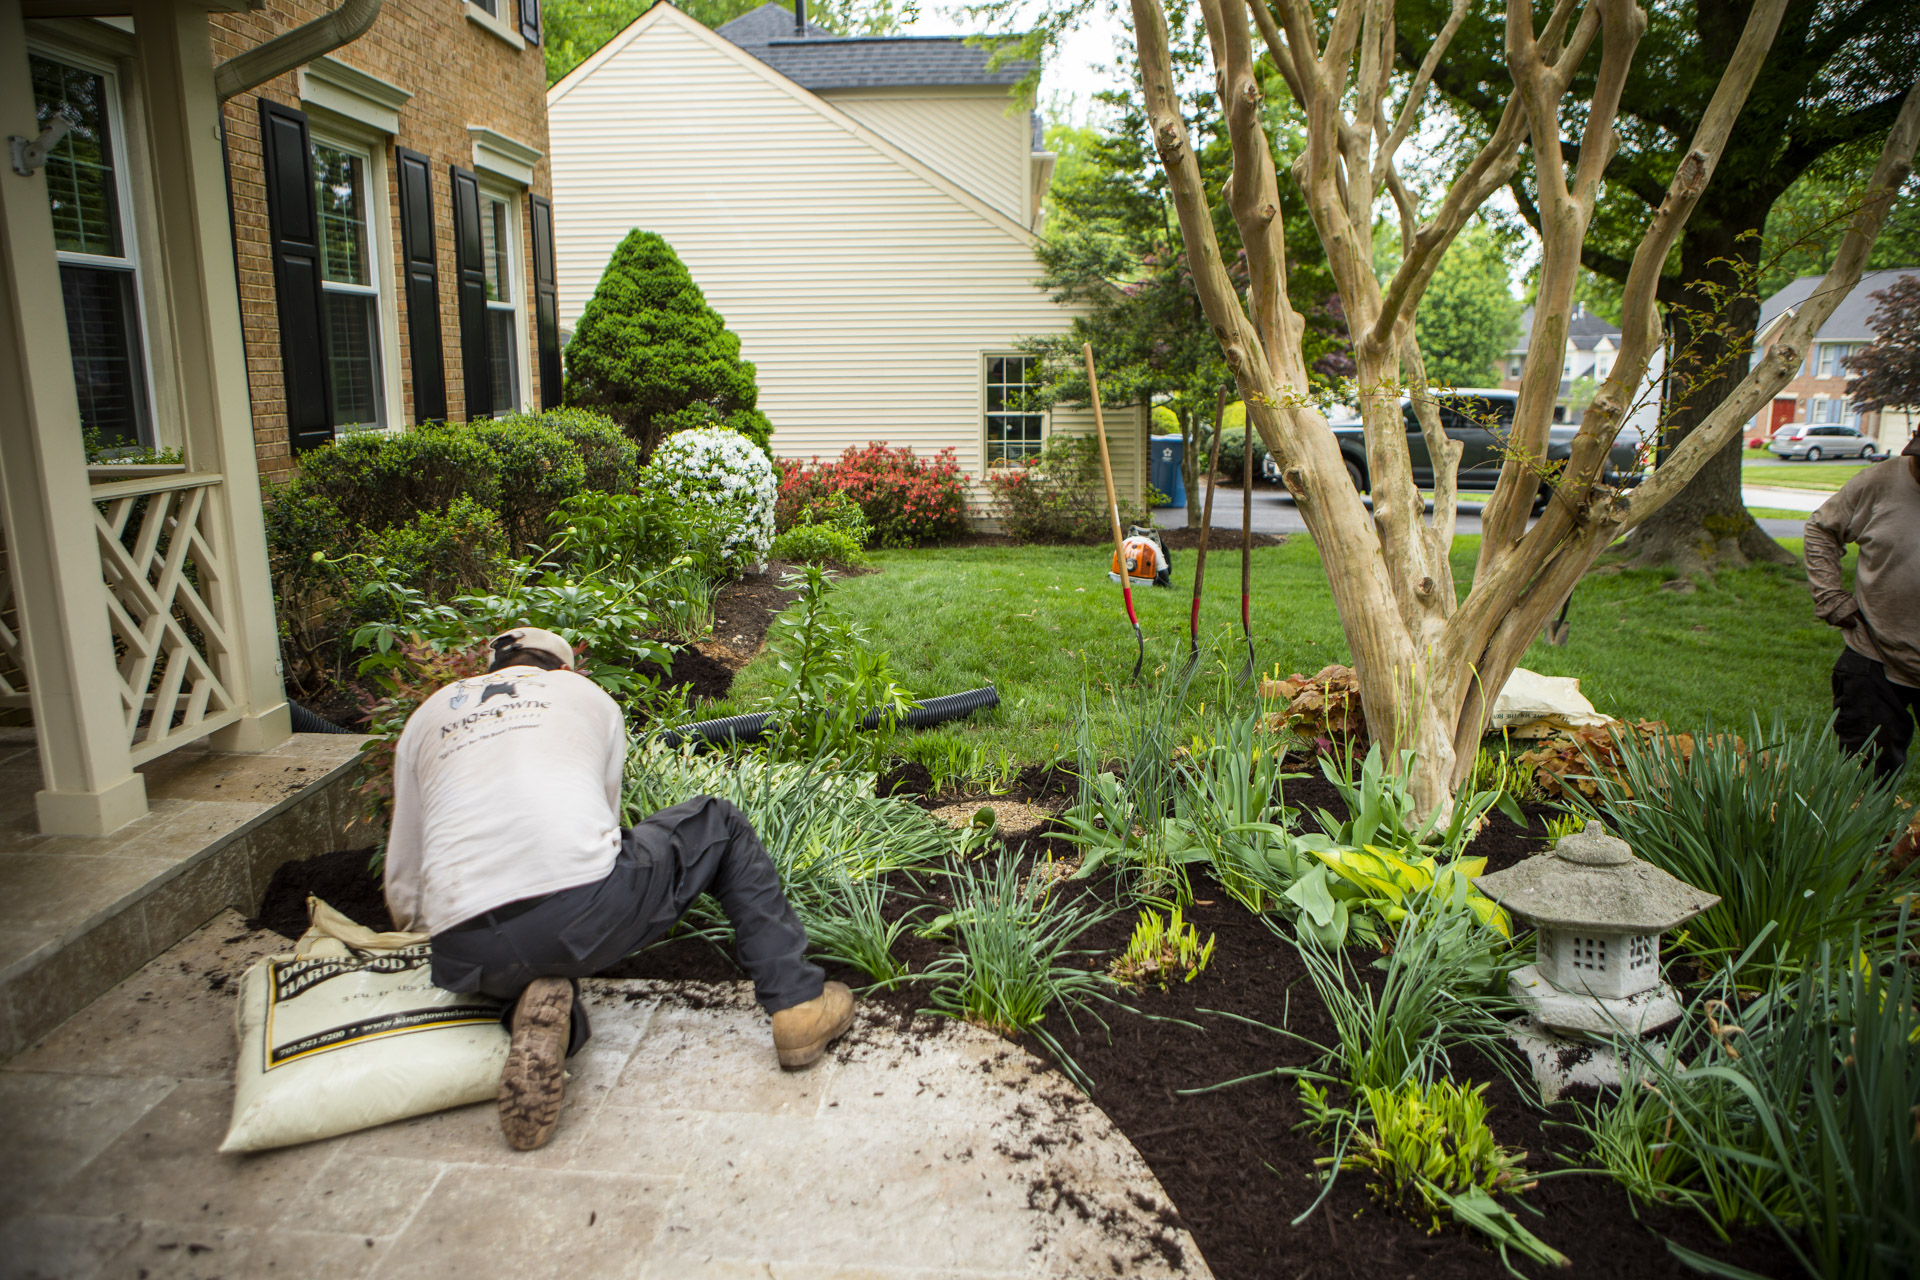 landscape technician applying mulch to keep plants healthy